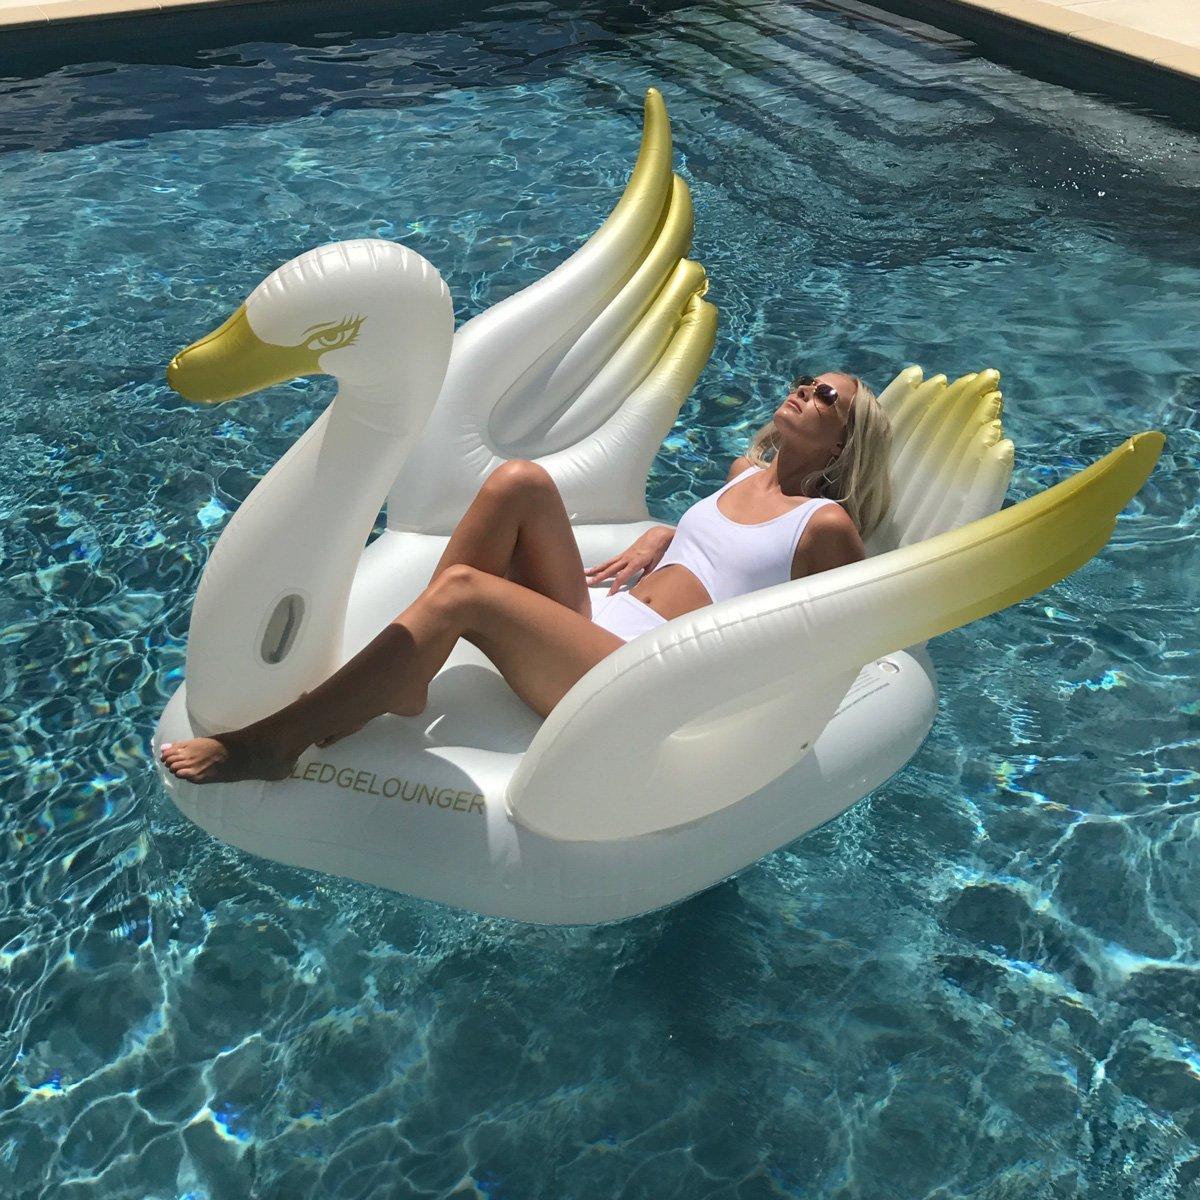 Amazon.com: Tumbona flotador de cisne: Toys & Games